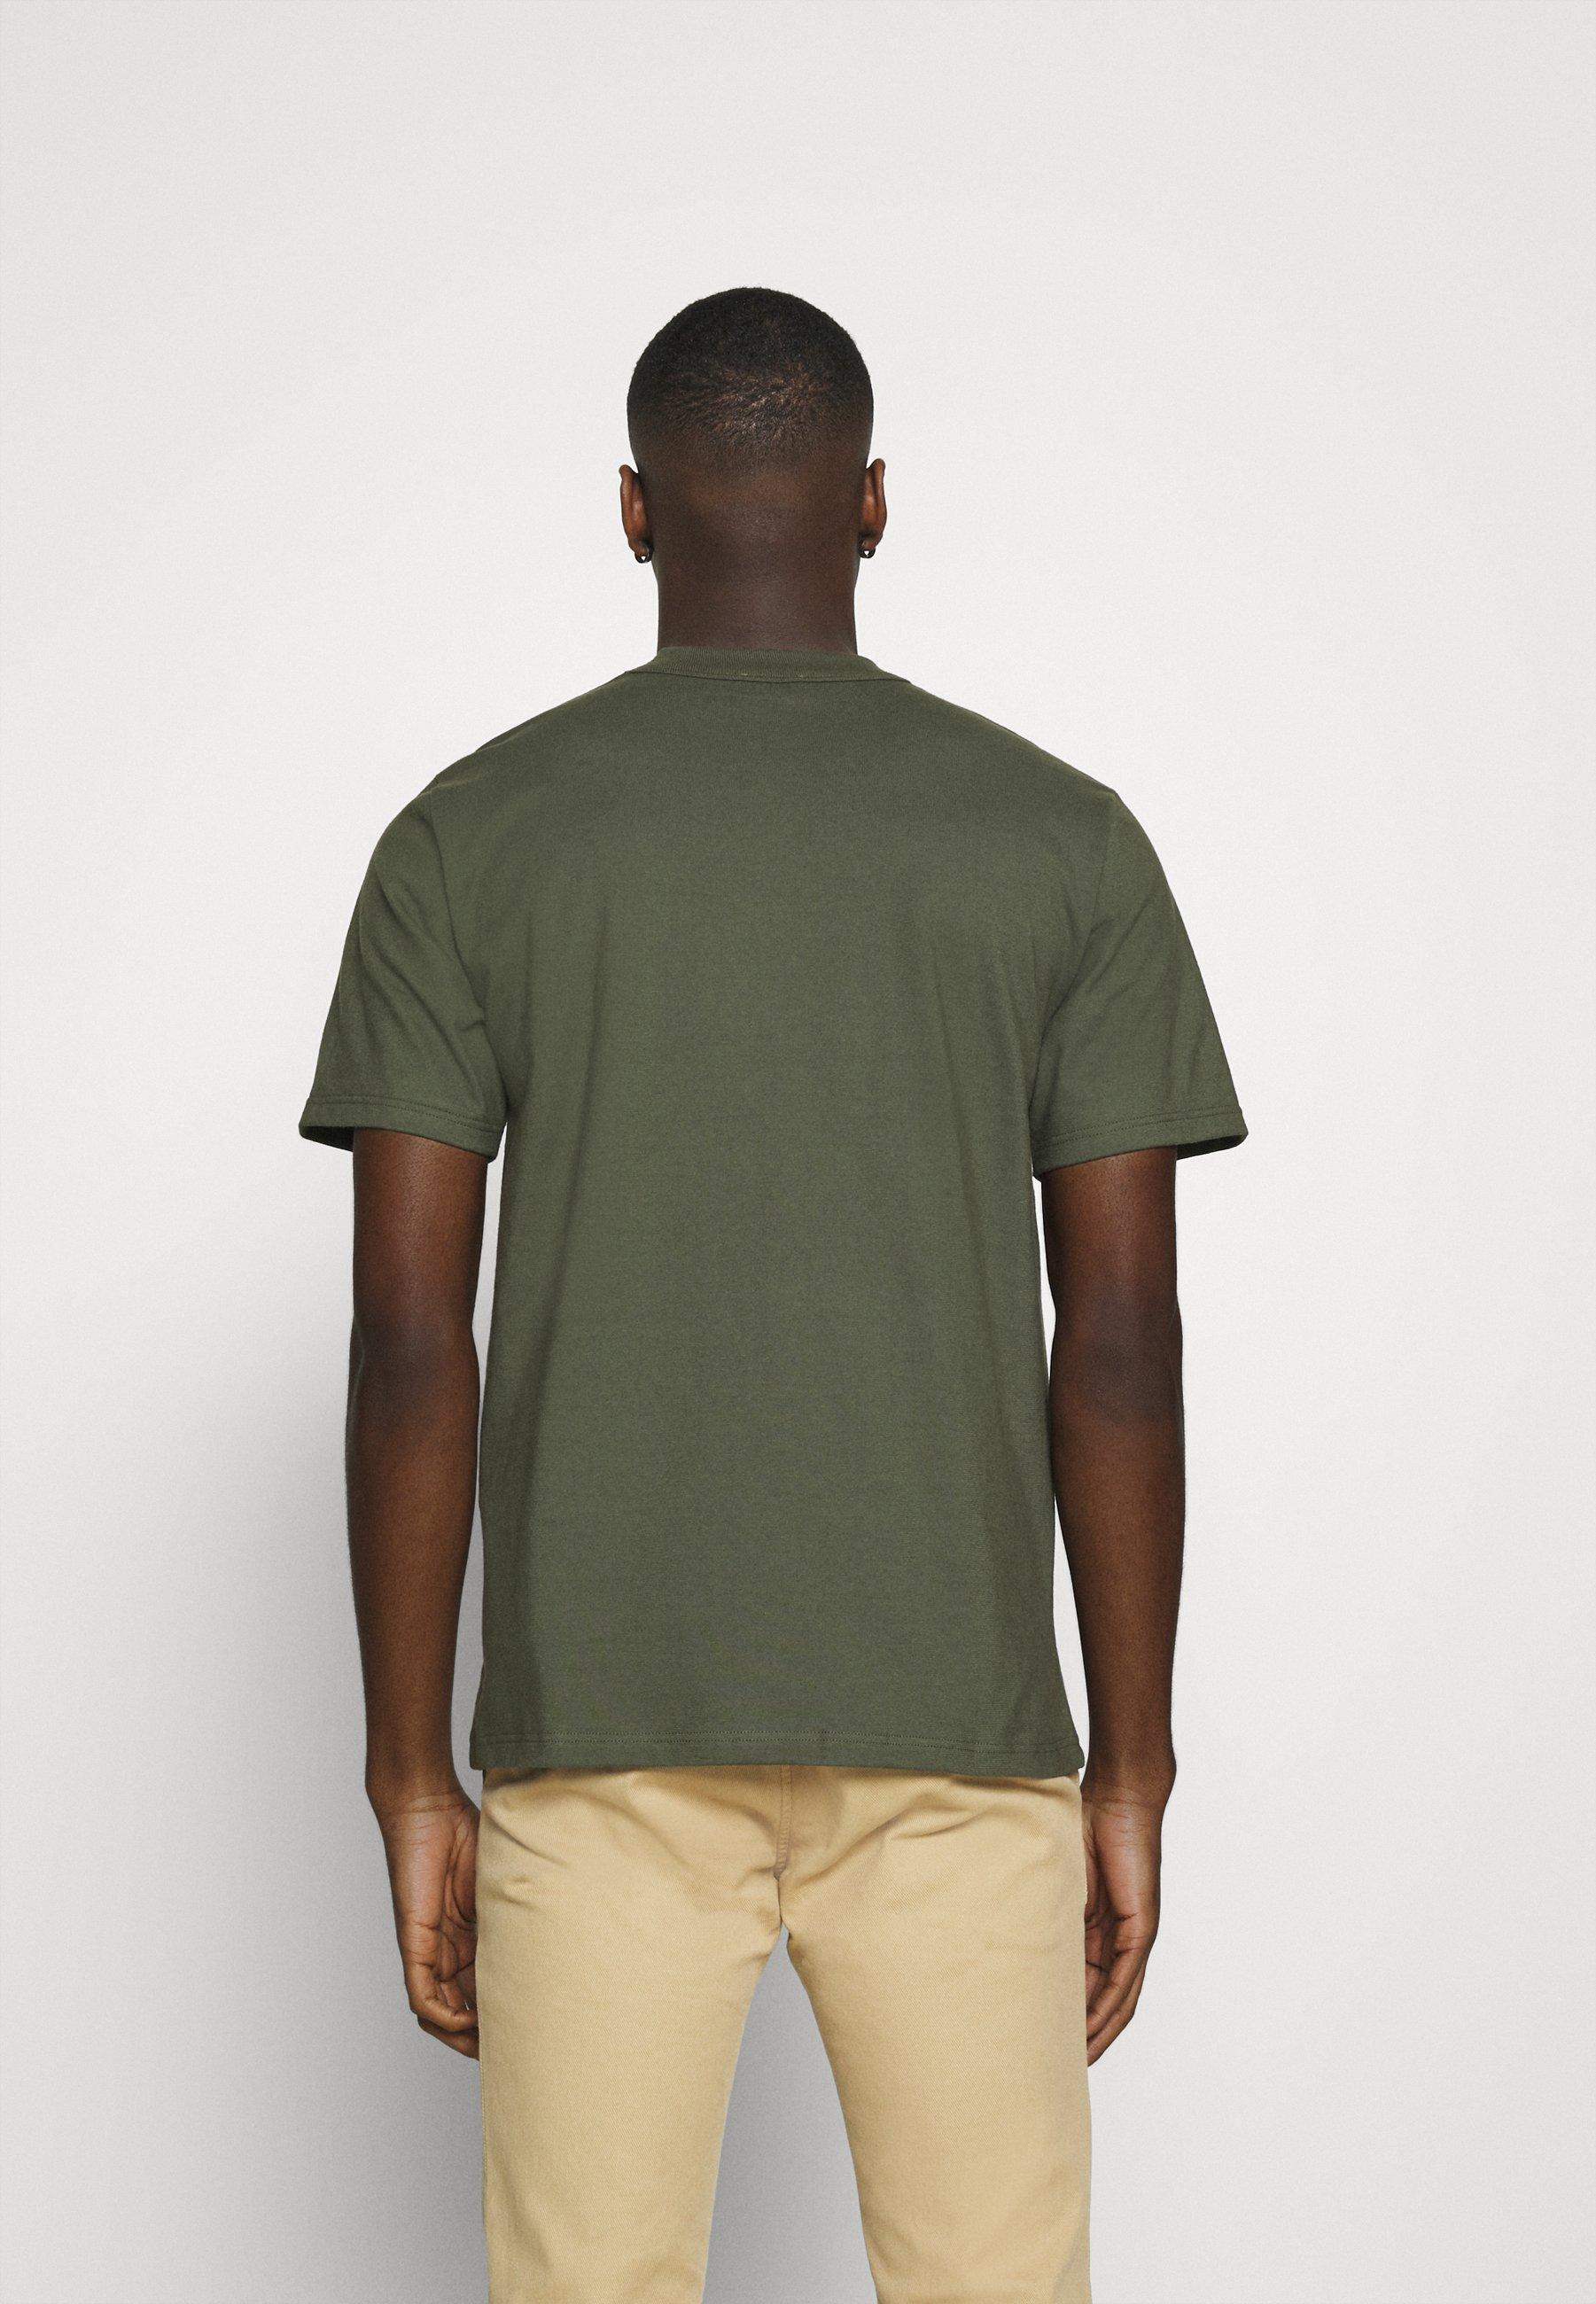 Armor lux CALLAC - Basic T-shirt - epica TFI2B